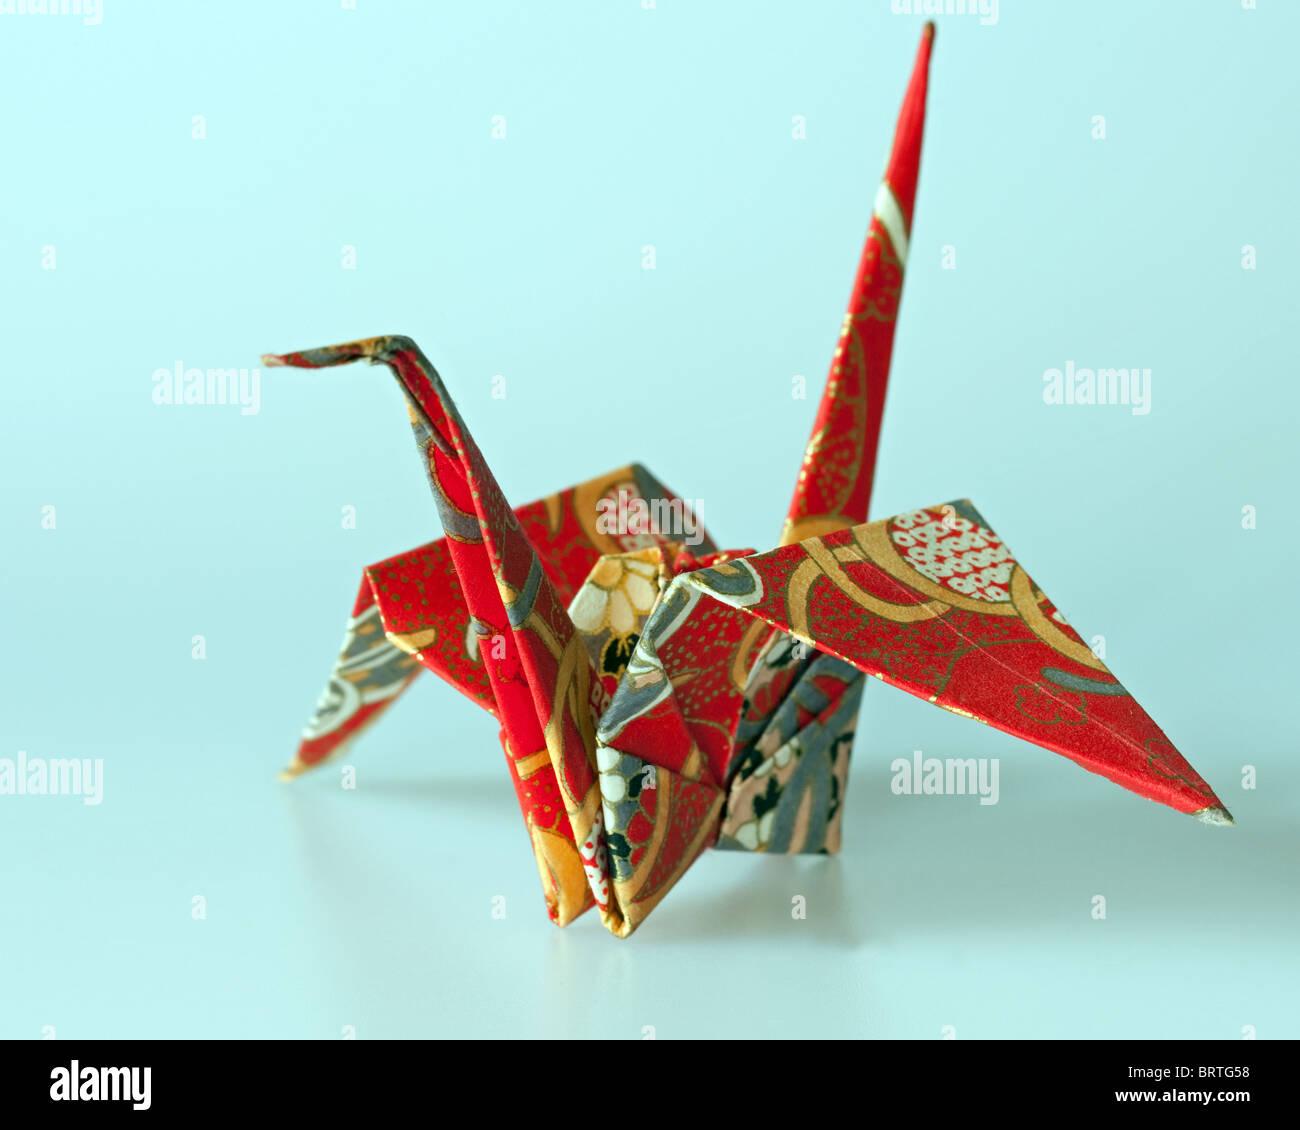 Japanische Origami-Kranich Stockbild